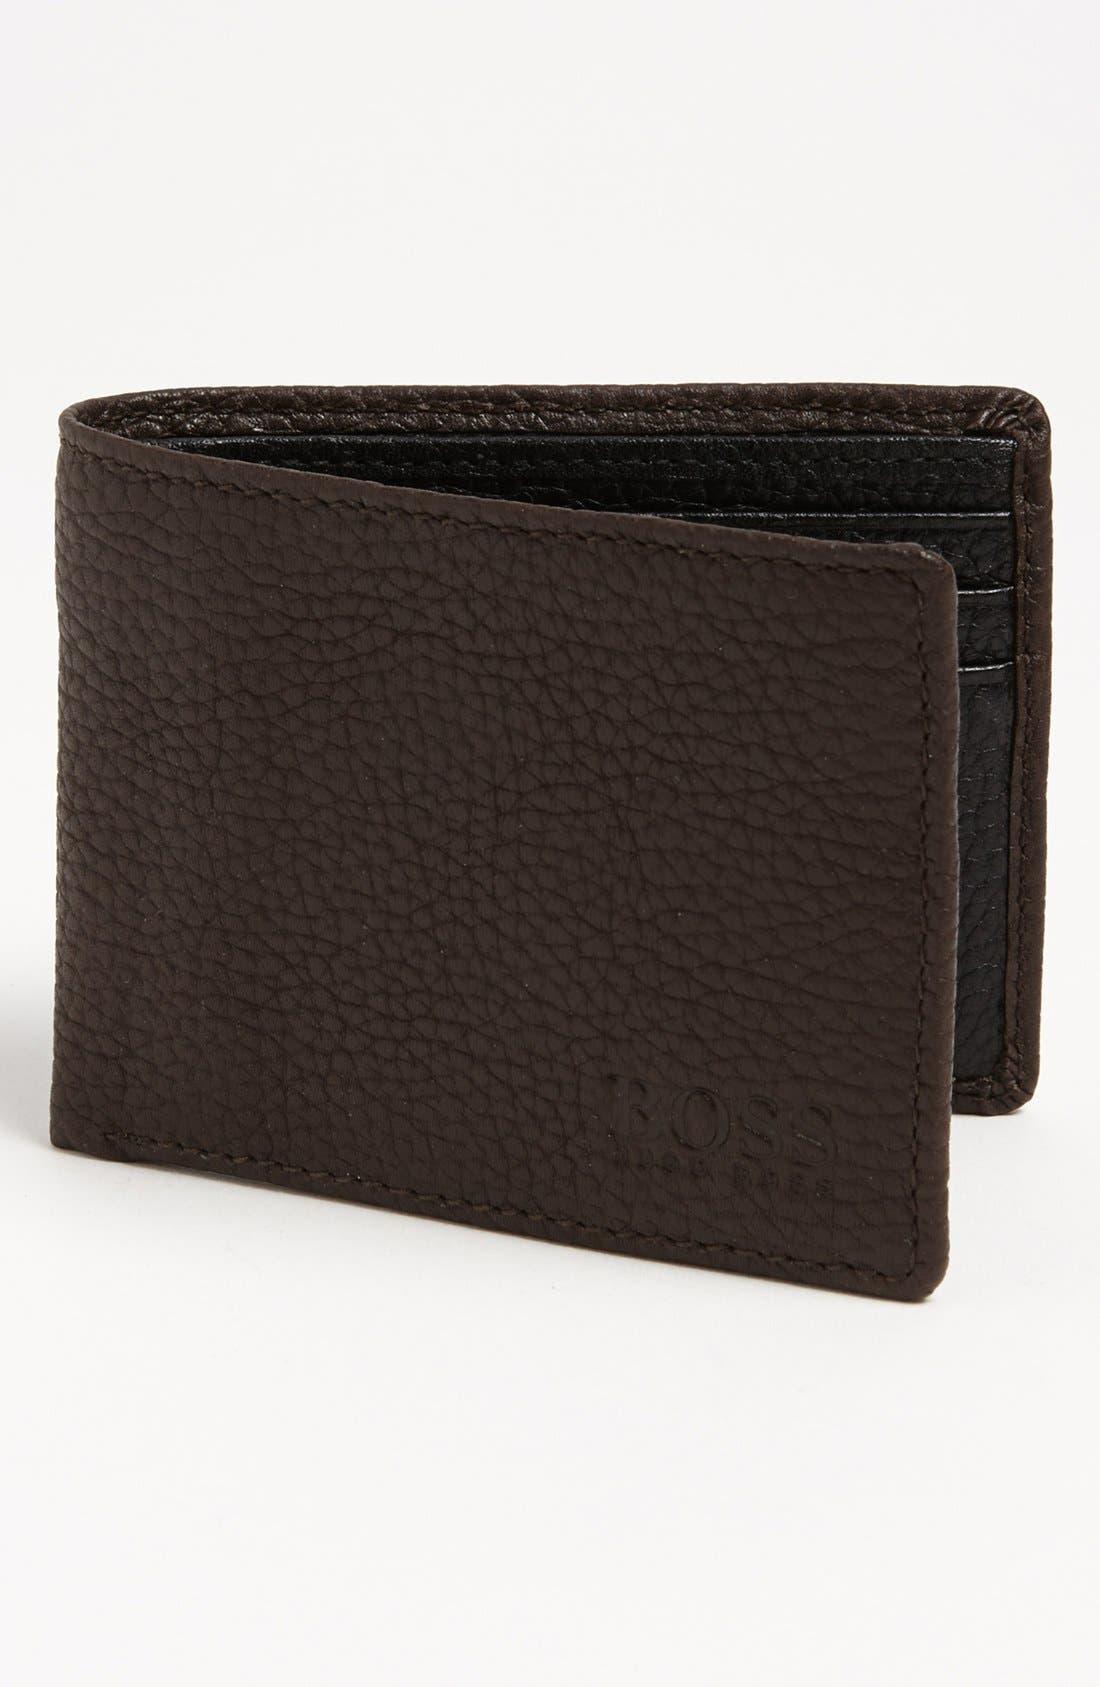 Alternate Image 1 Selected - BOSS HUGO BOSS 'Beckley' Wallet